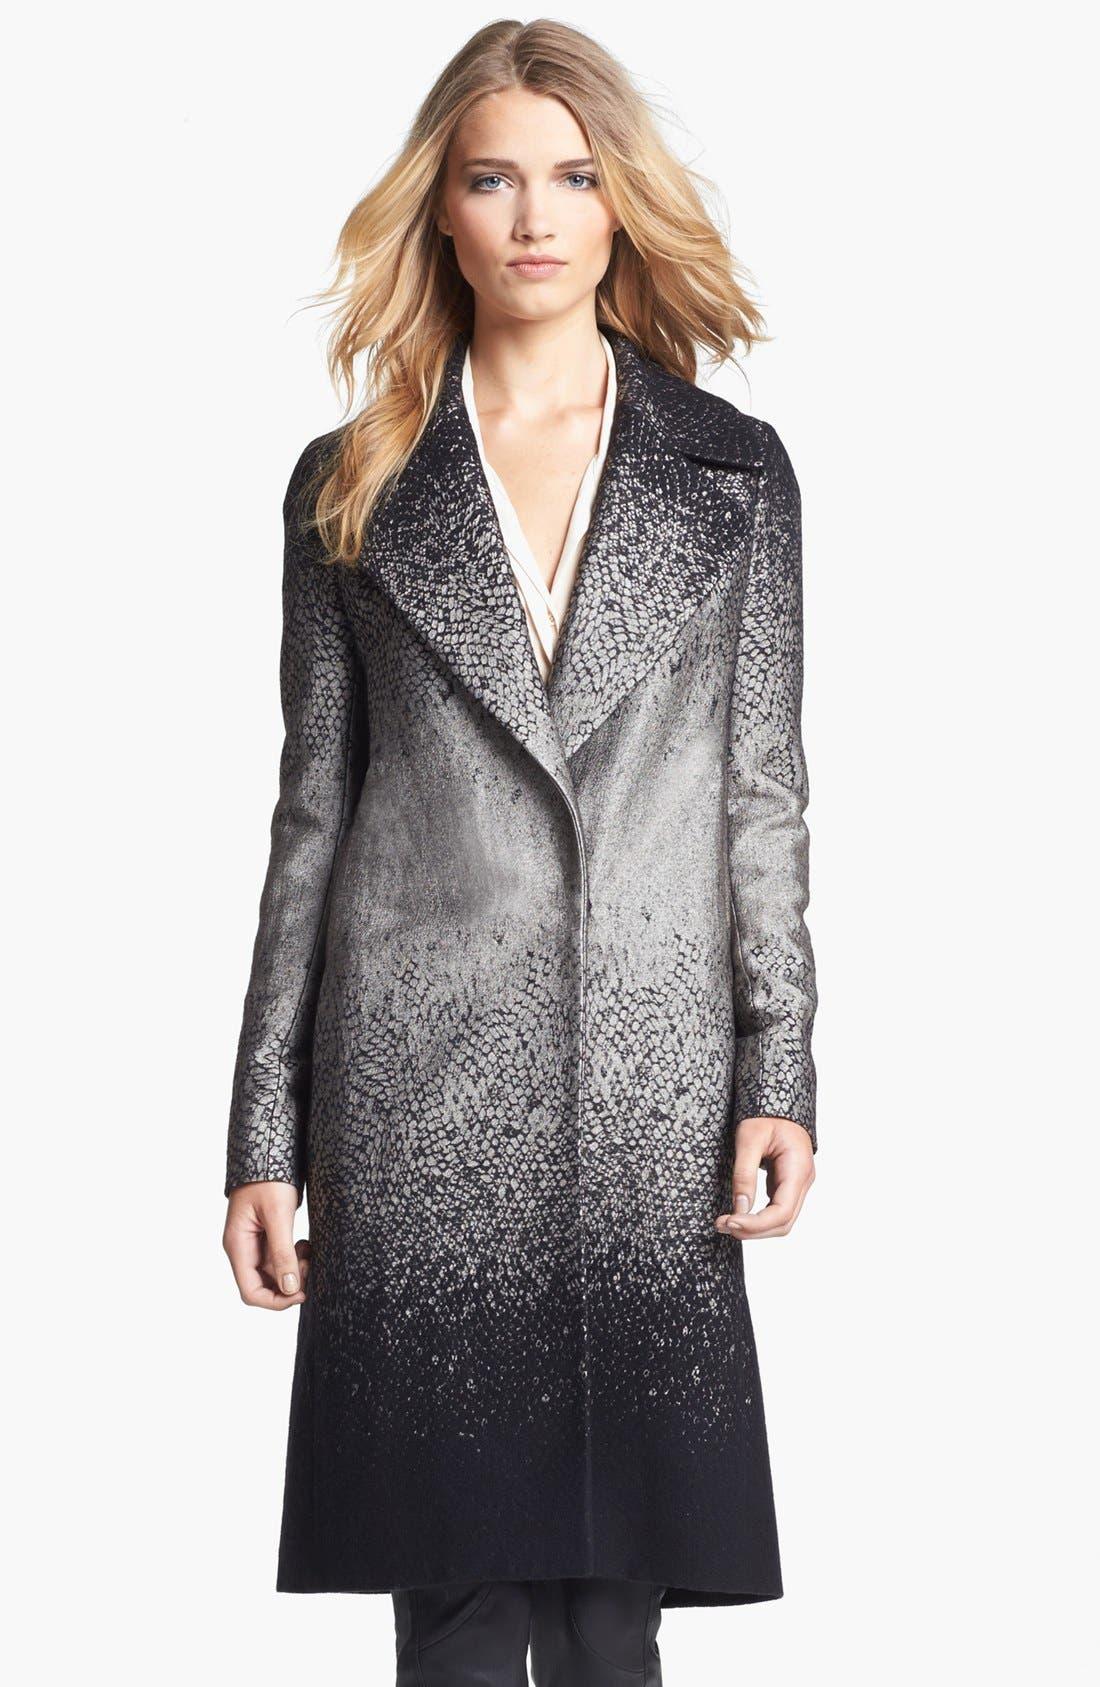 Main Image - Diane von Furstenberg 'Nala' Woven Coat